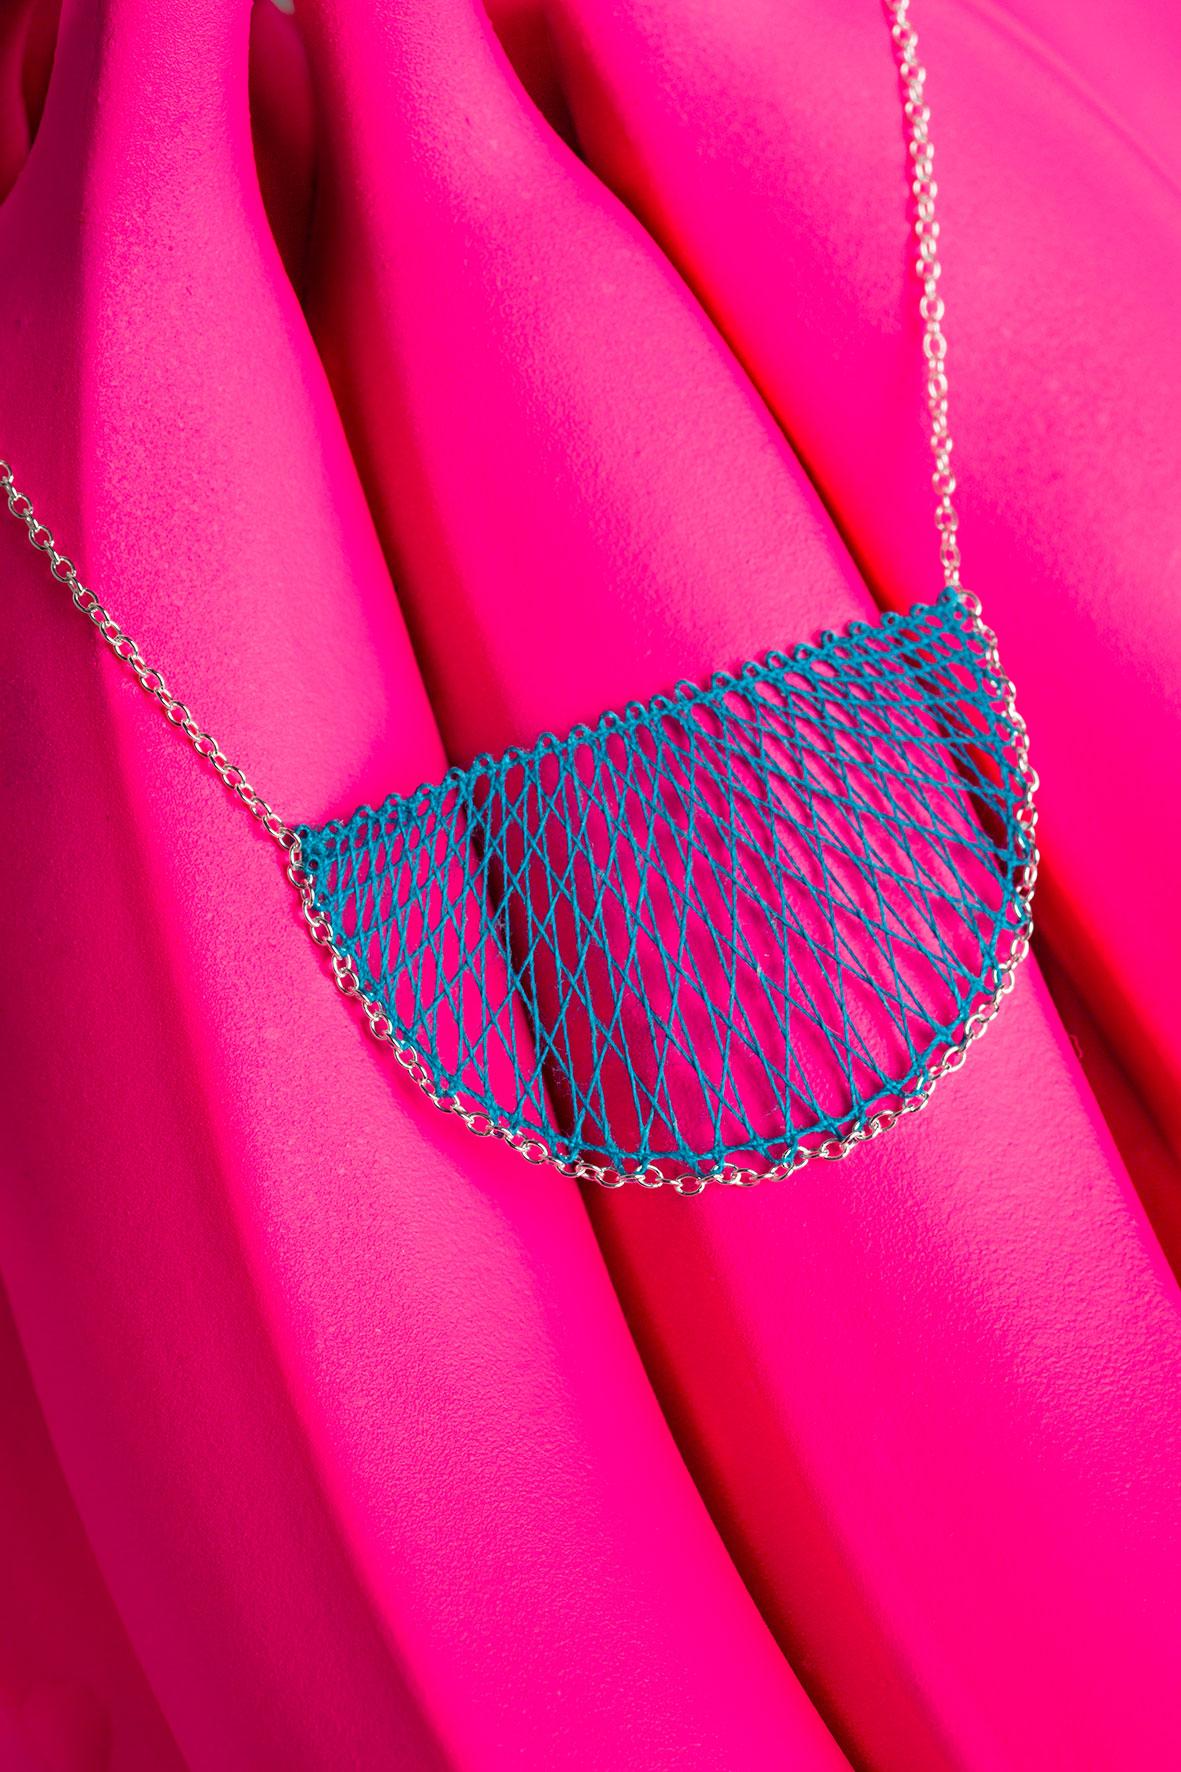 Inlace-Jewelry-4